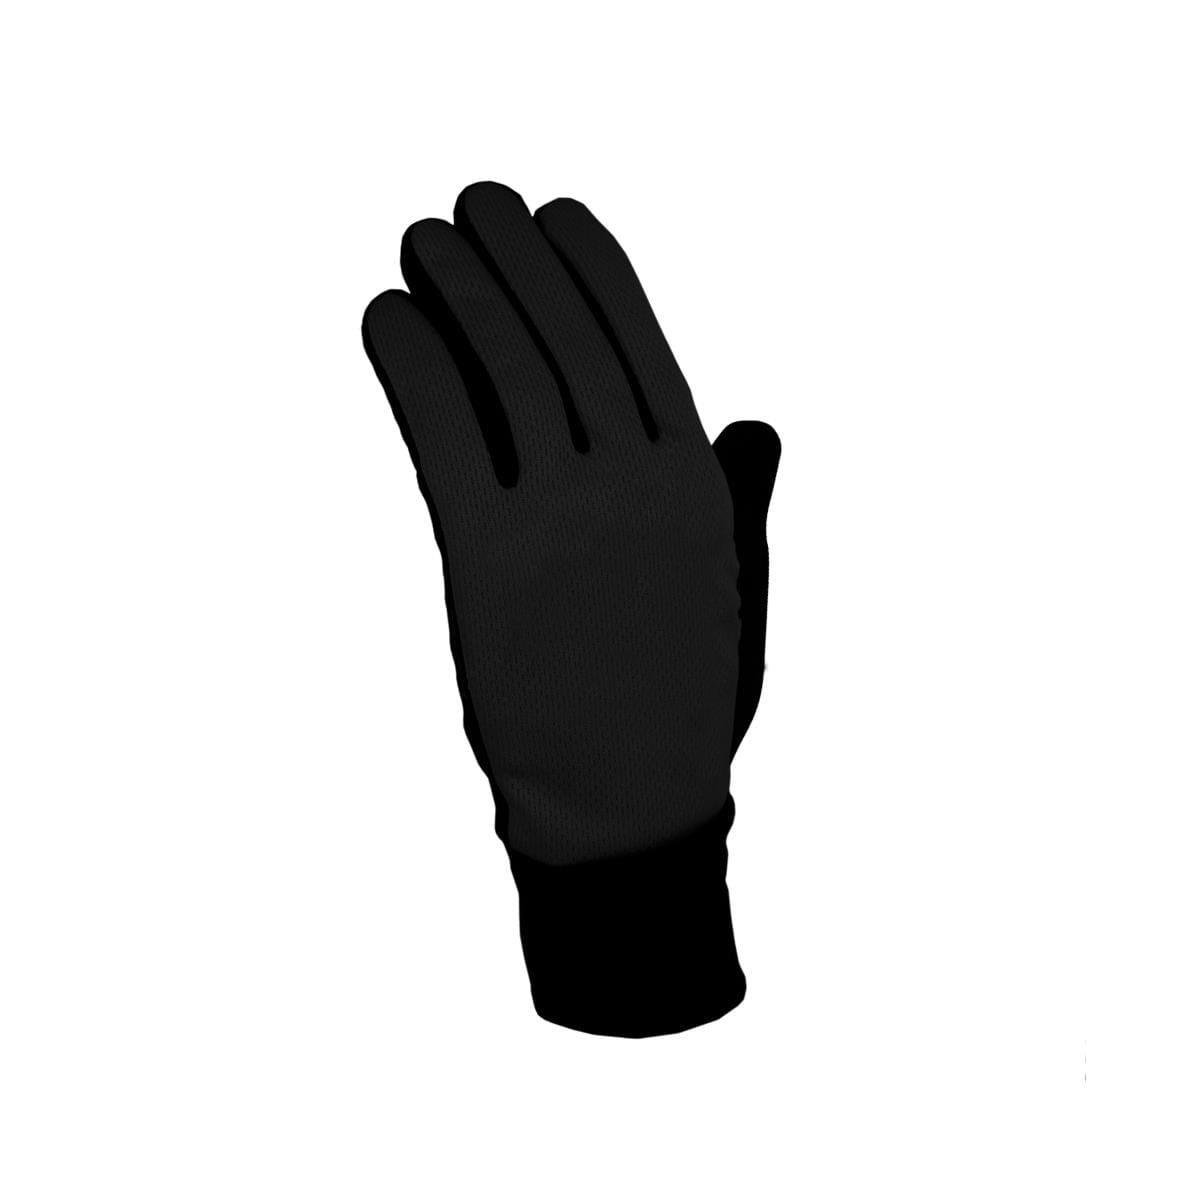 Microfleece Gloves